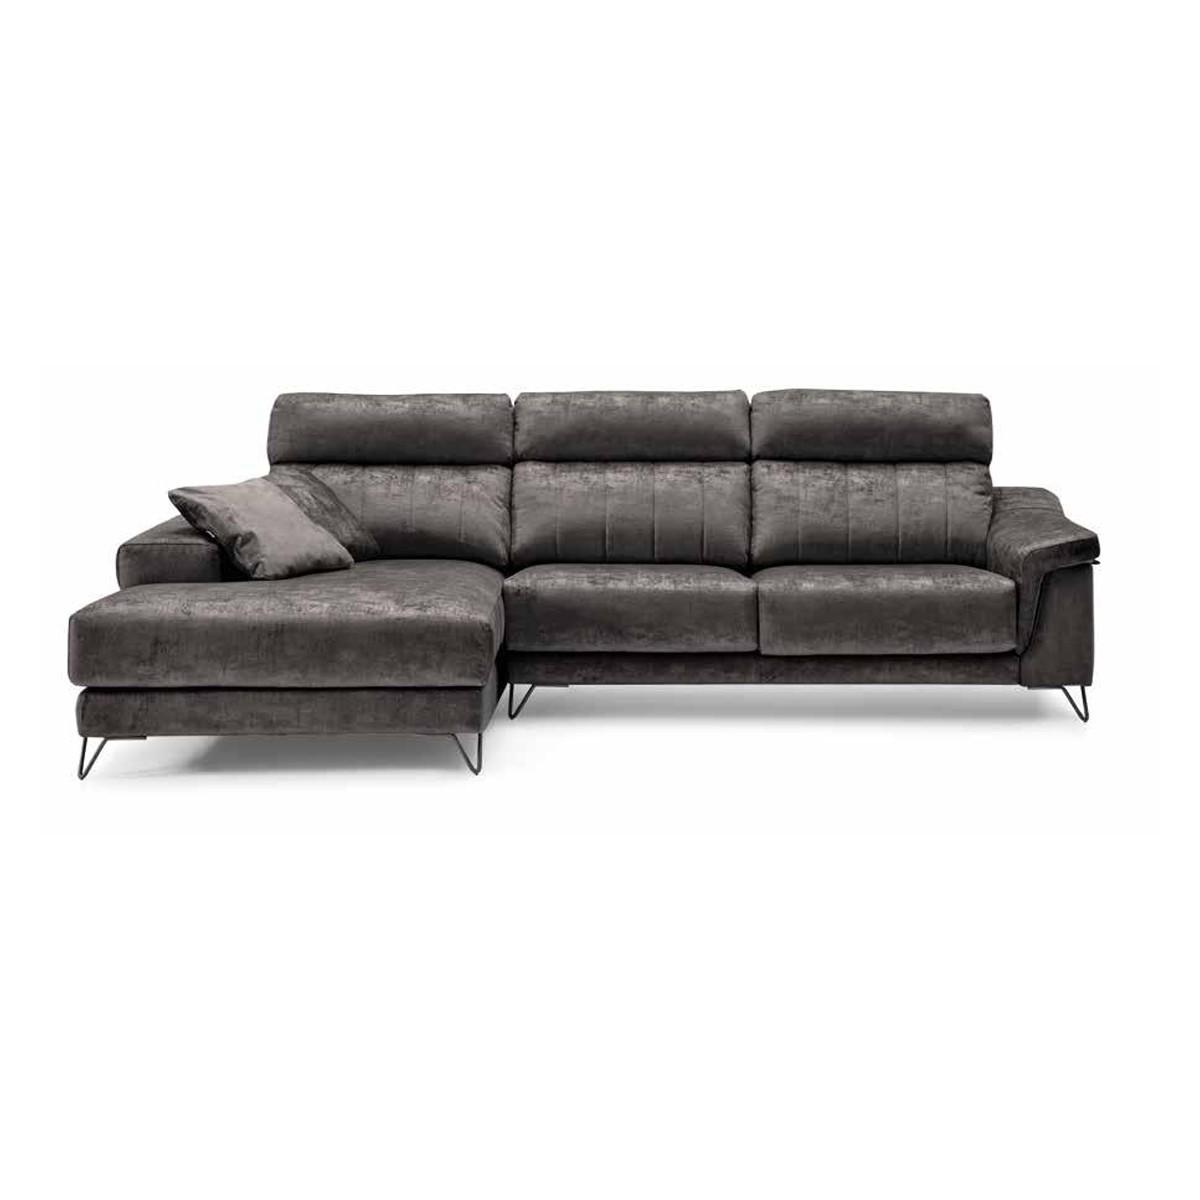 Room Sofa by Divani